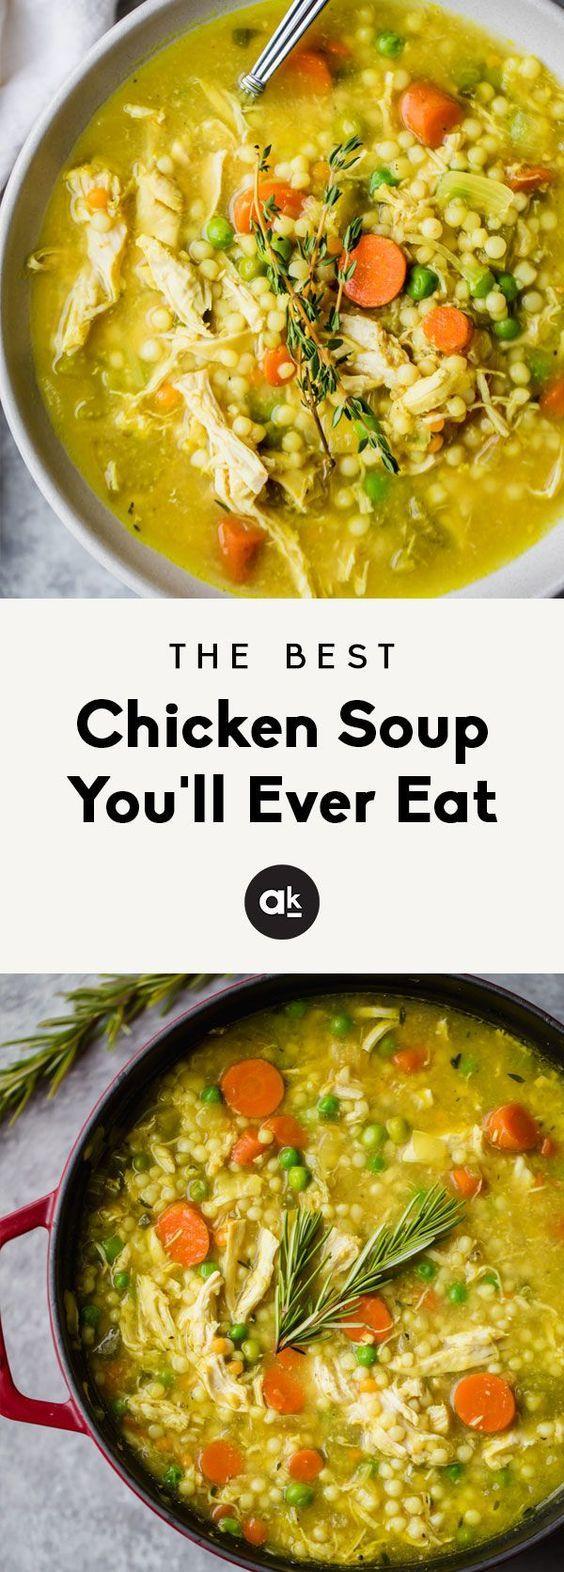 The Best Chicken Soup You'll Ever Eat #soupandsalad